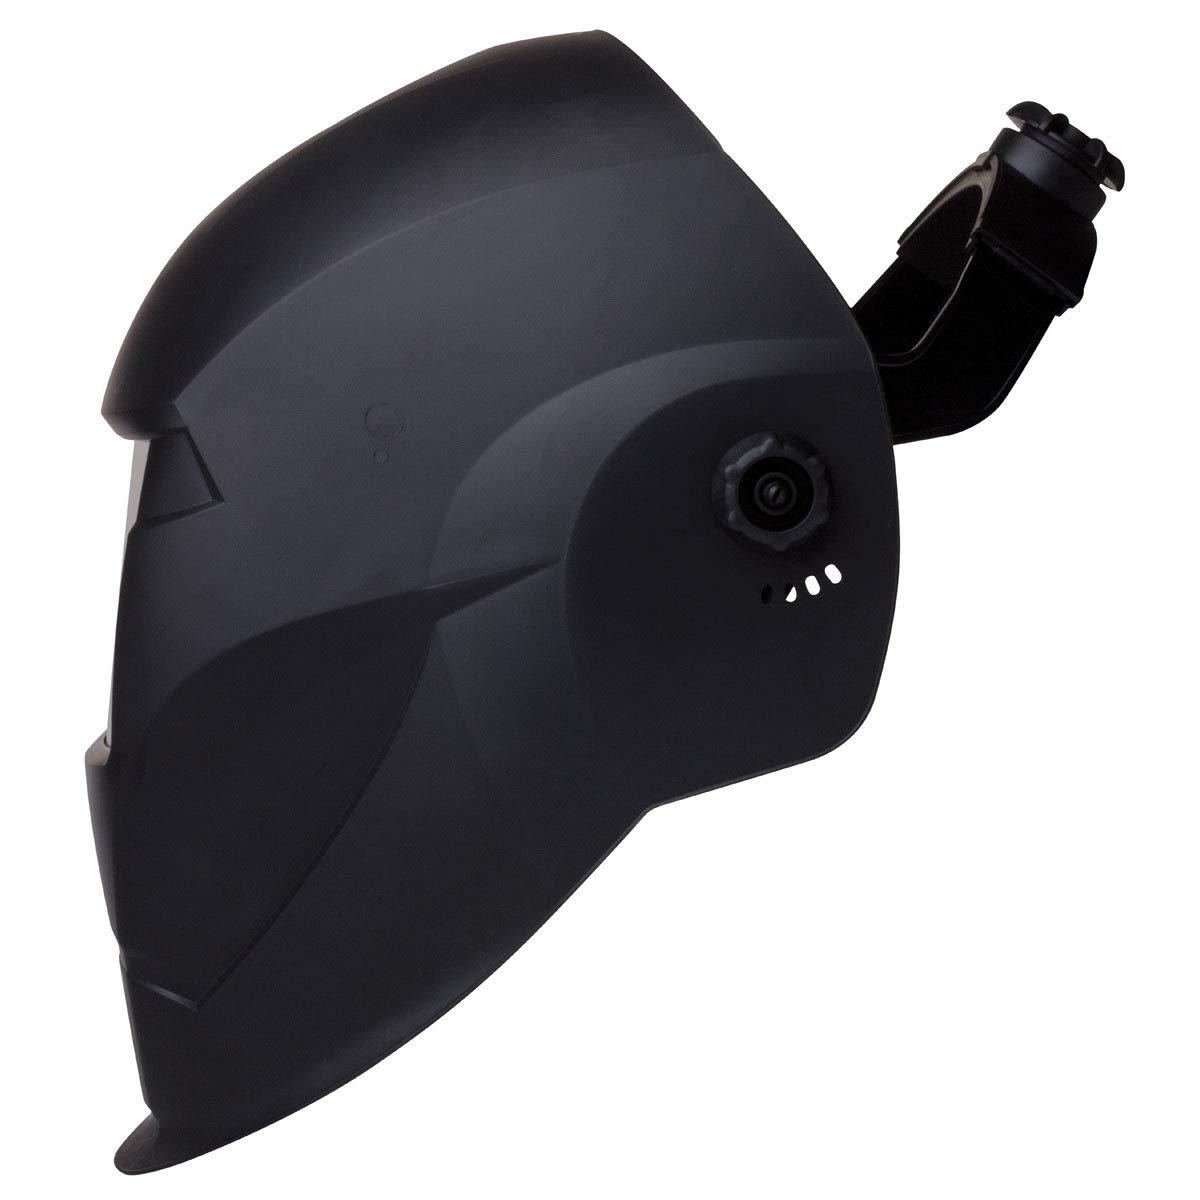 Eastwood Welding Helmet Auto-Darkening Lightweight Maximum Eye /& Face UV and IR Protection When Welding